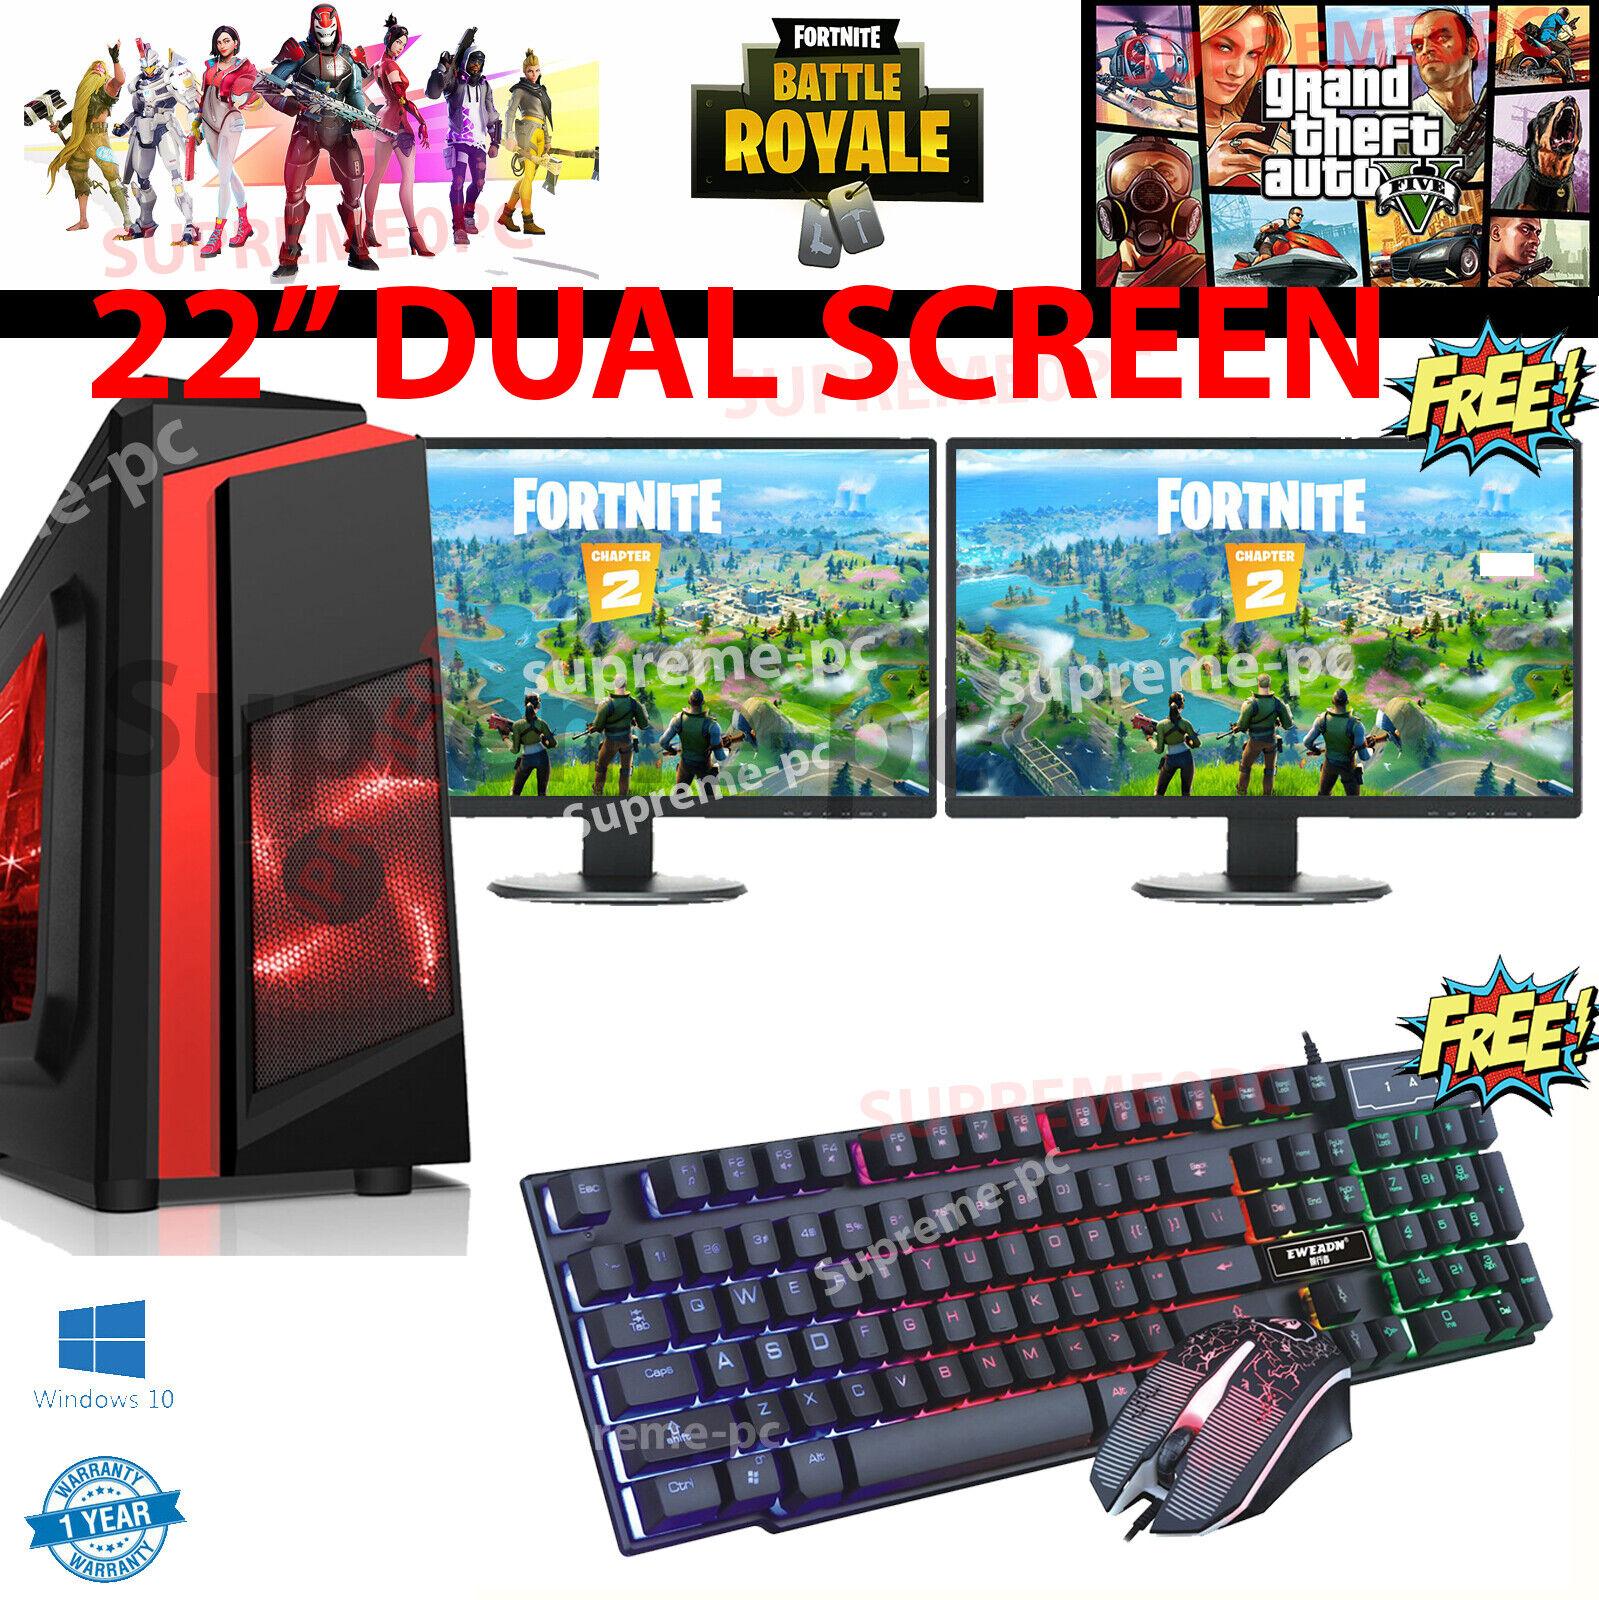 "Computer Games - Fast Gaming PC Computer 22"" DUAL SCREEN intel Core i5 16GB 1TB Win 10 2GB GT710"